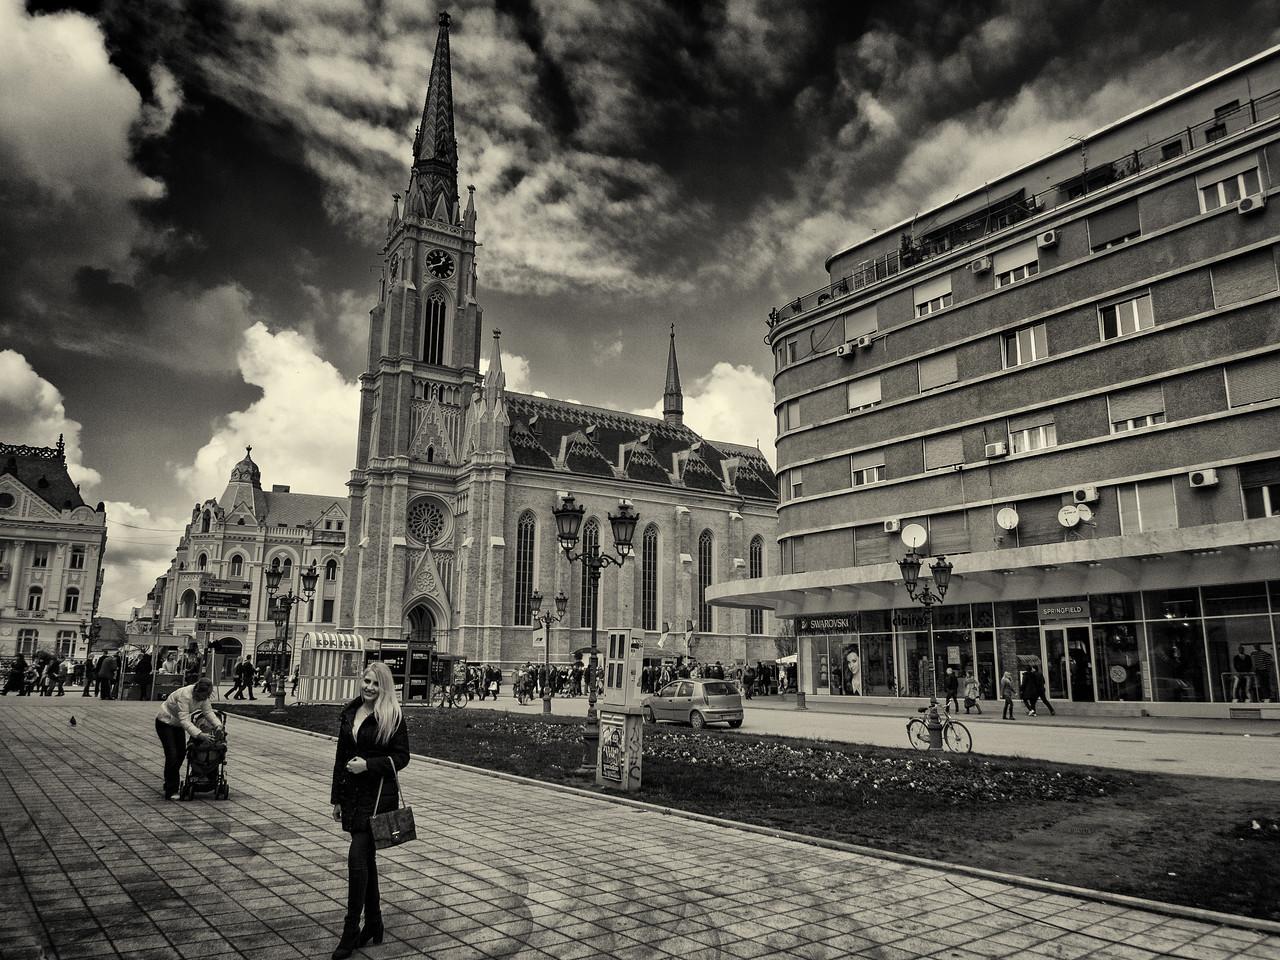 Life scene around the Liberty Square.